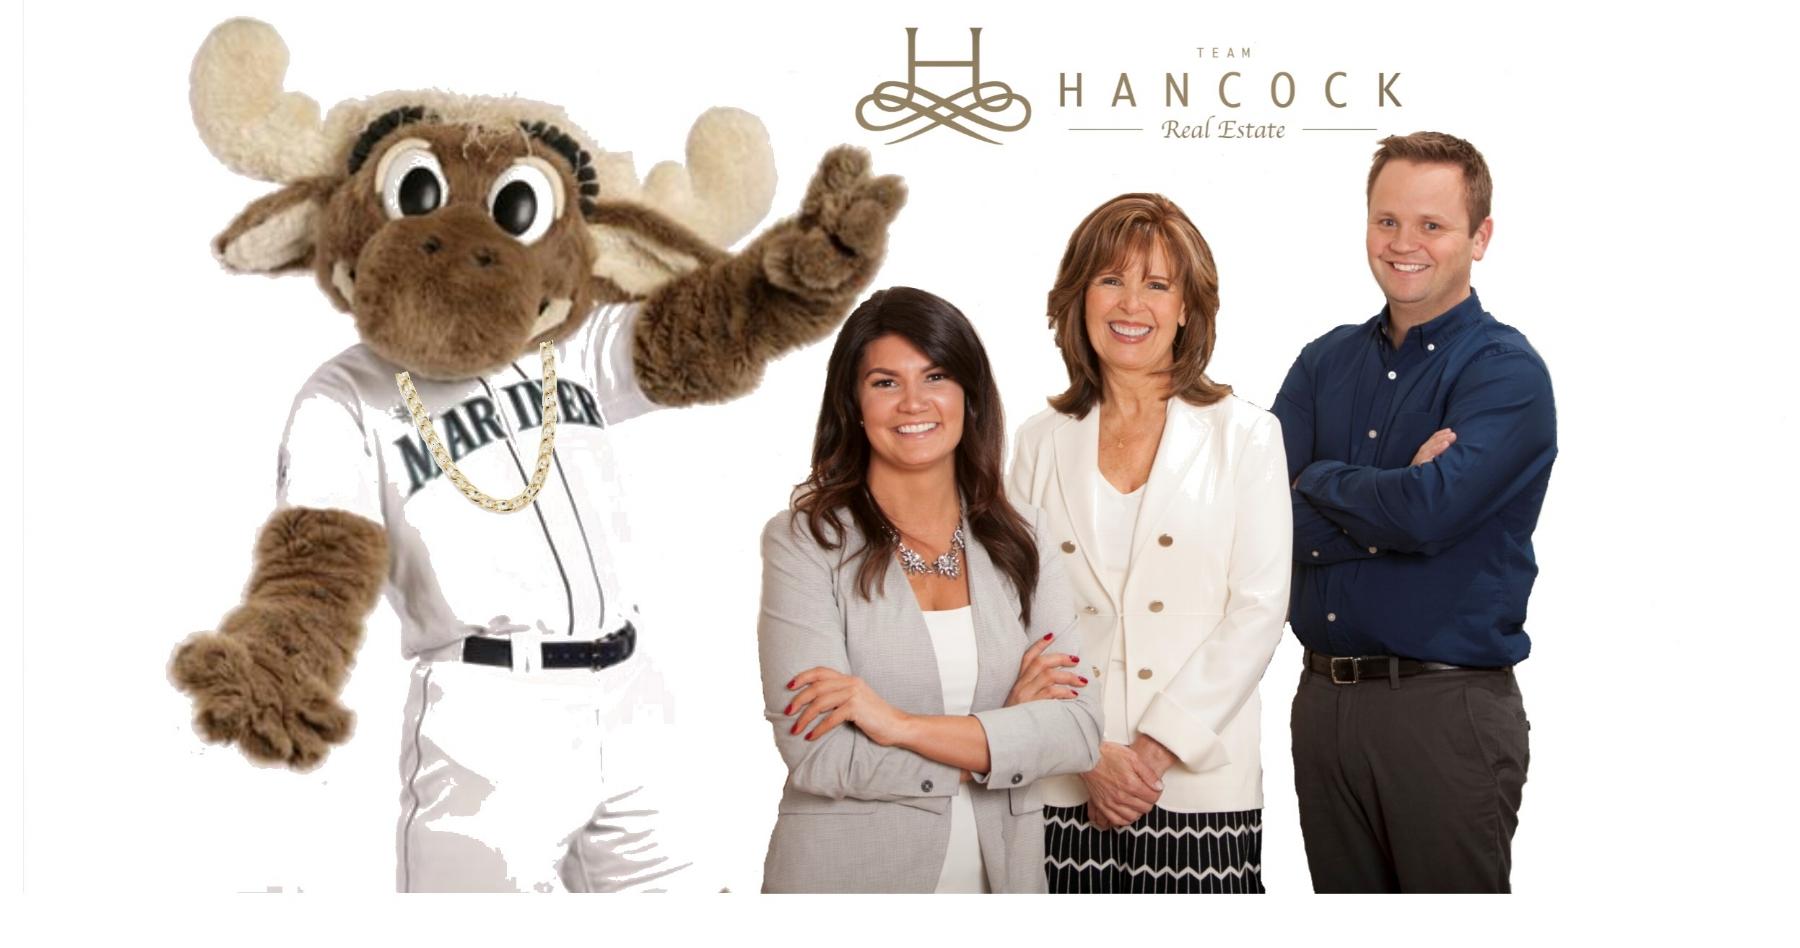 Team Hancock with the Moose.jpg